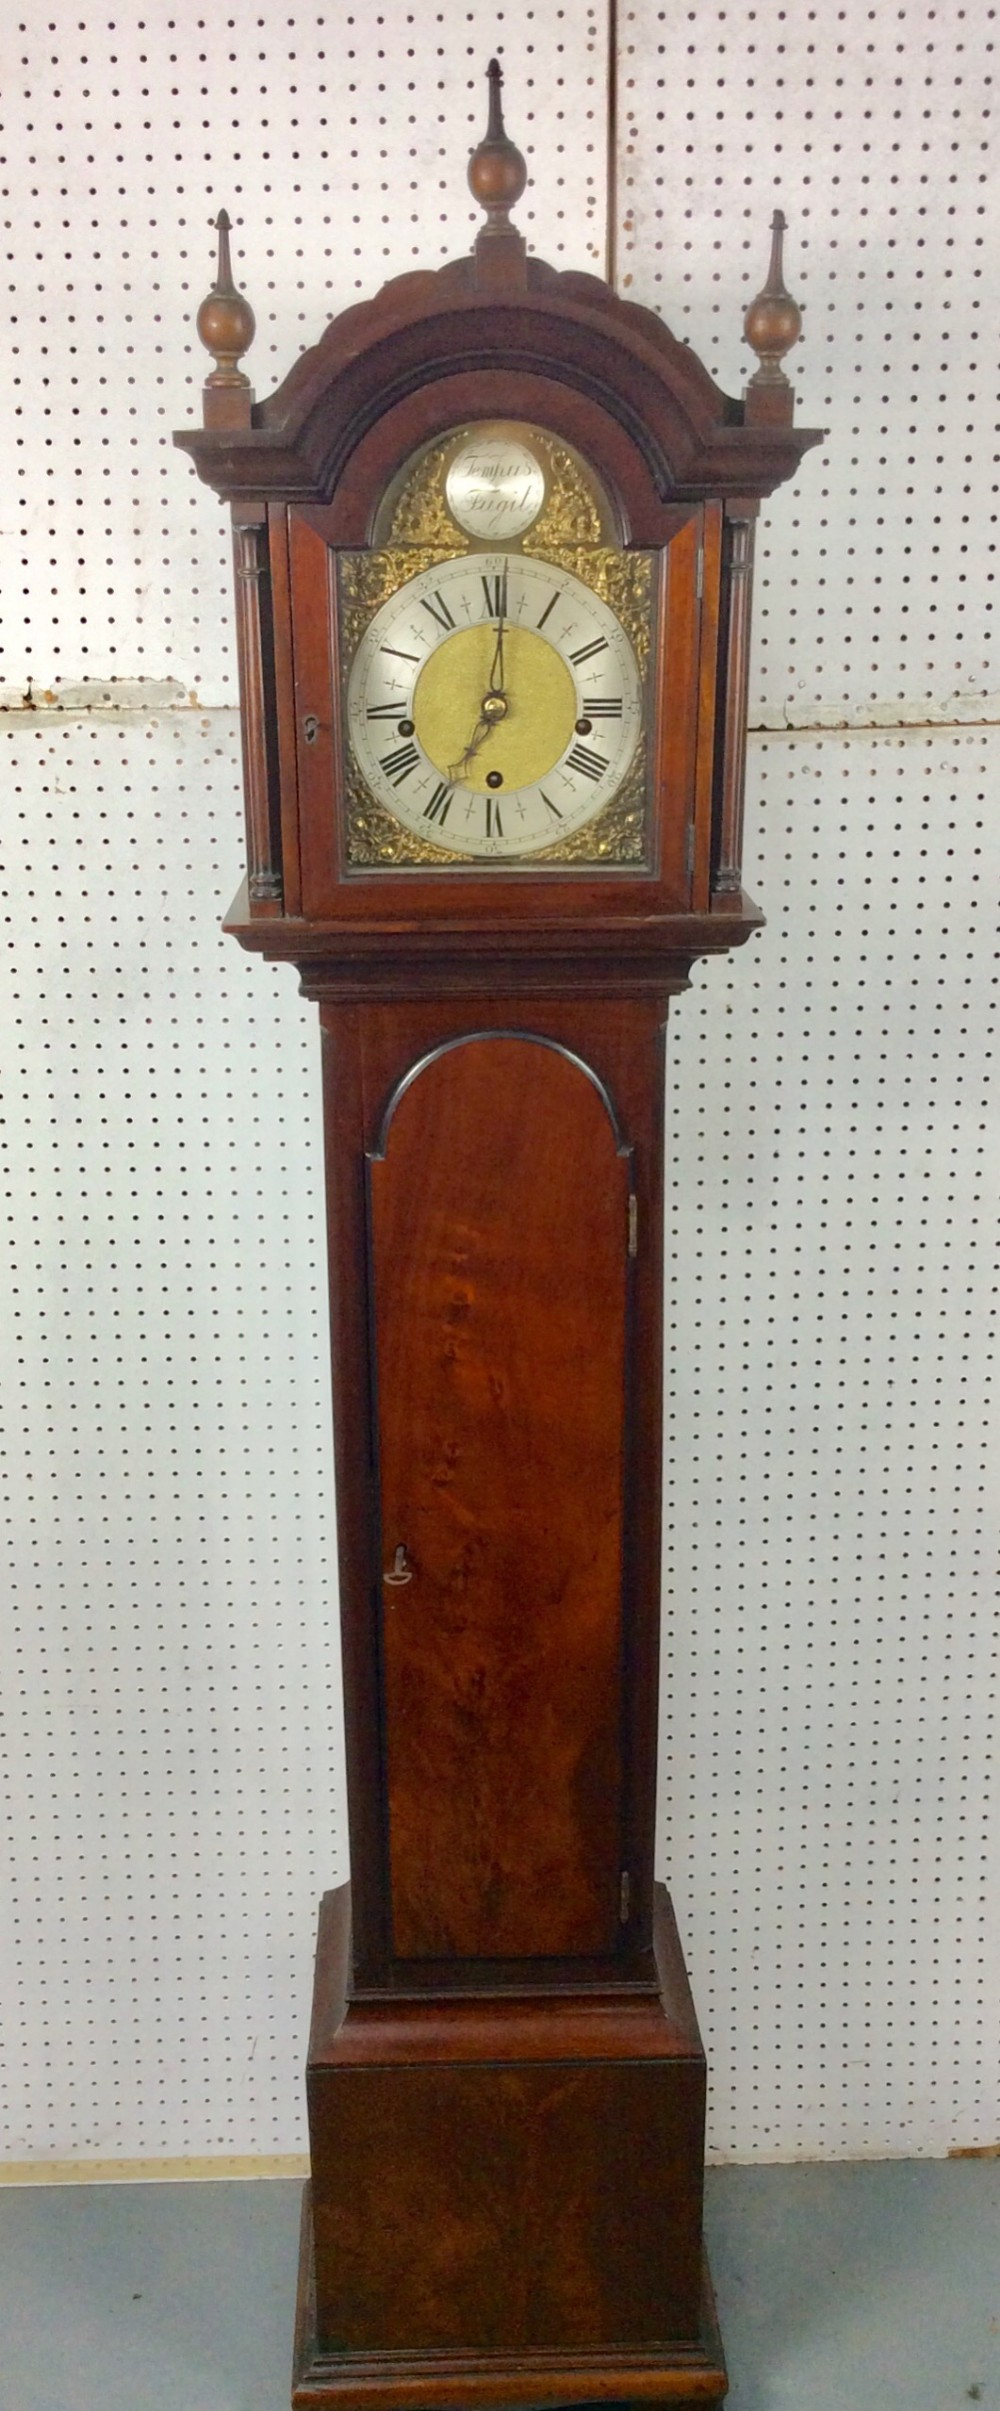 quarter chiming figured mahogany edwardian petite grandfather or grandmother longcase clock